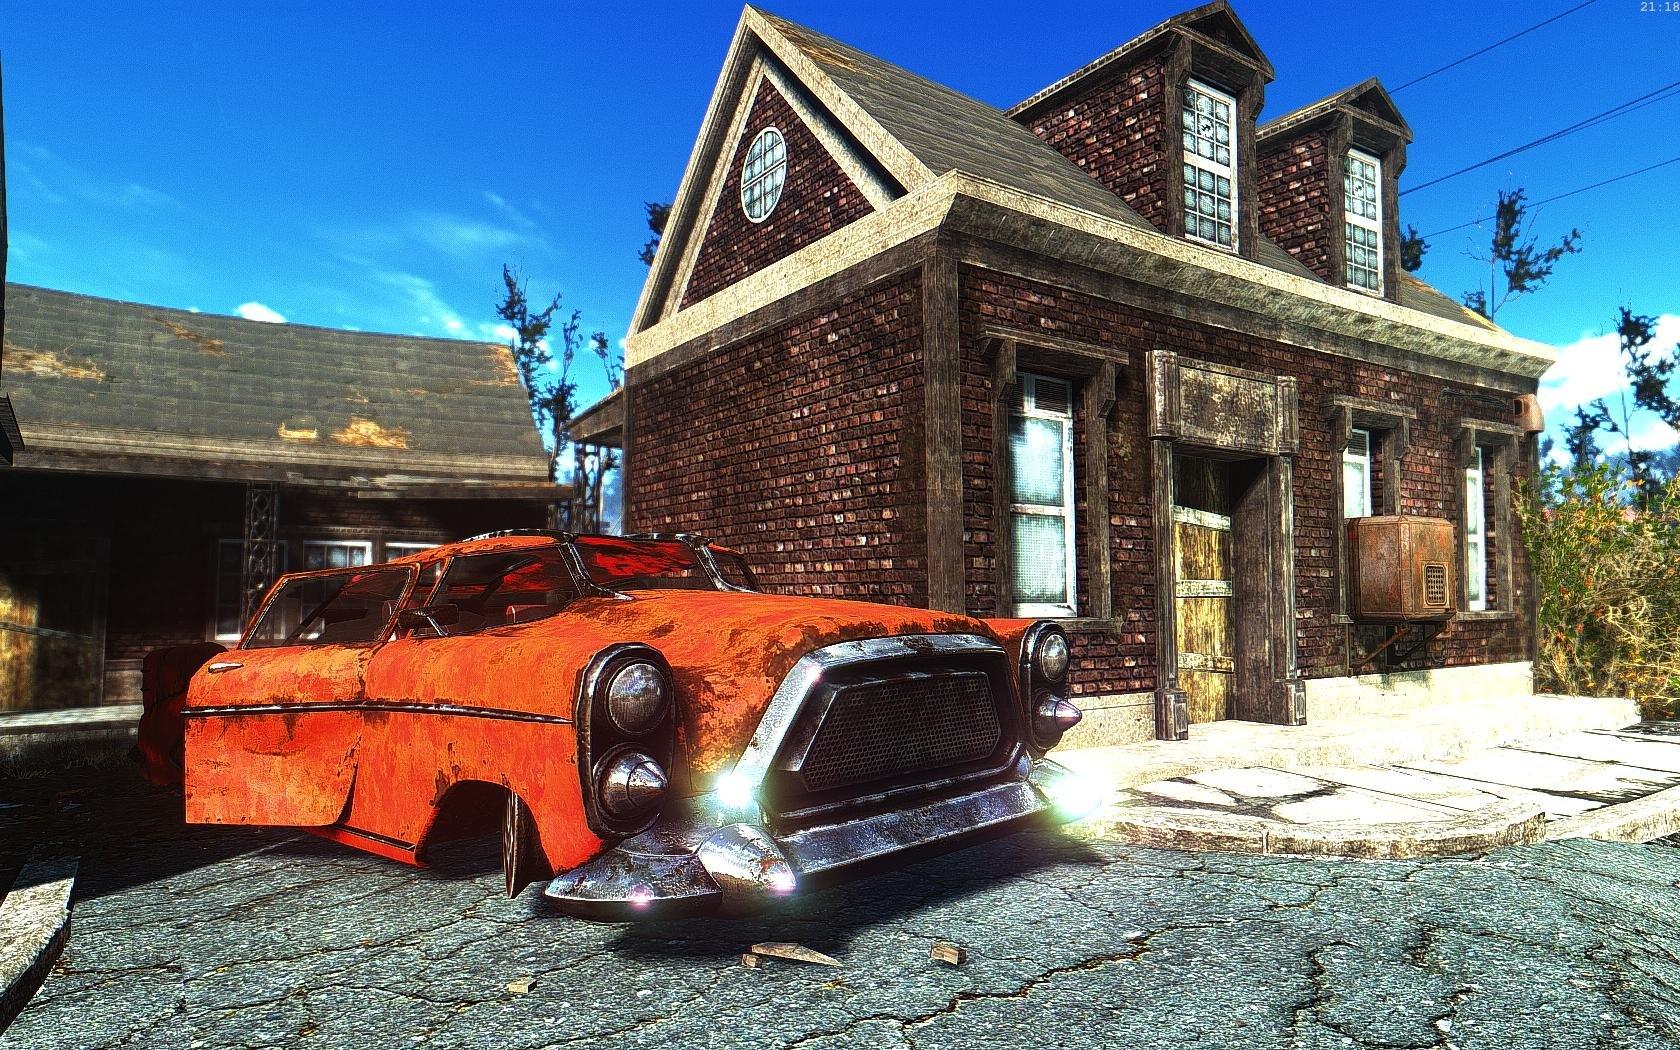 Fallout4 2019-01-03 21-18-51-88